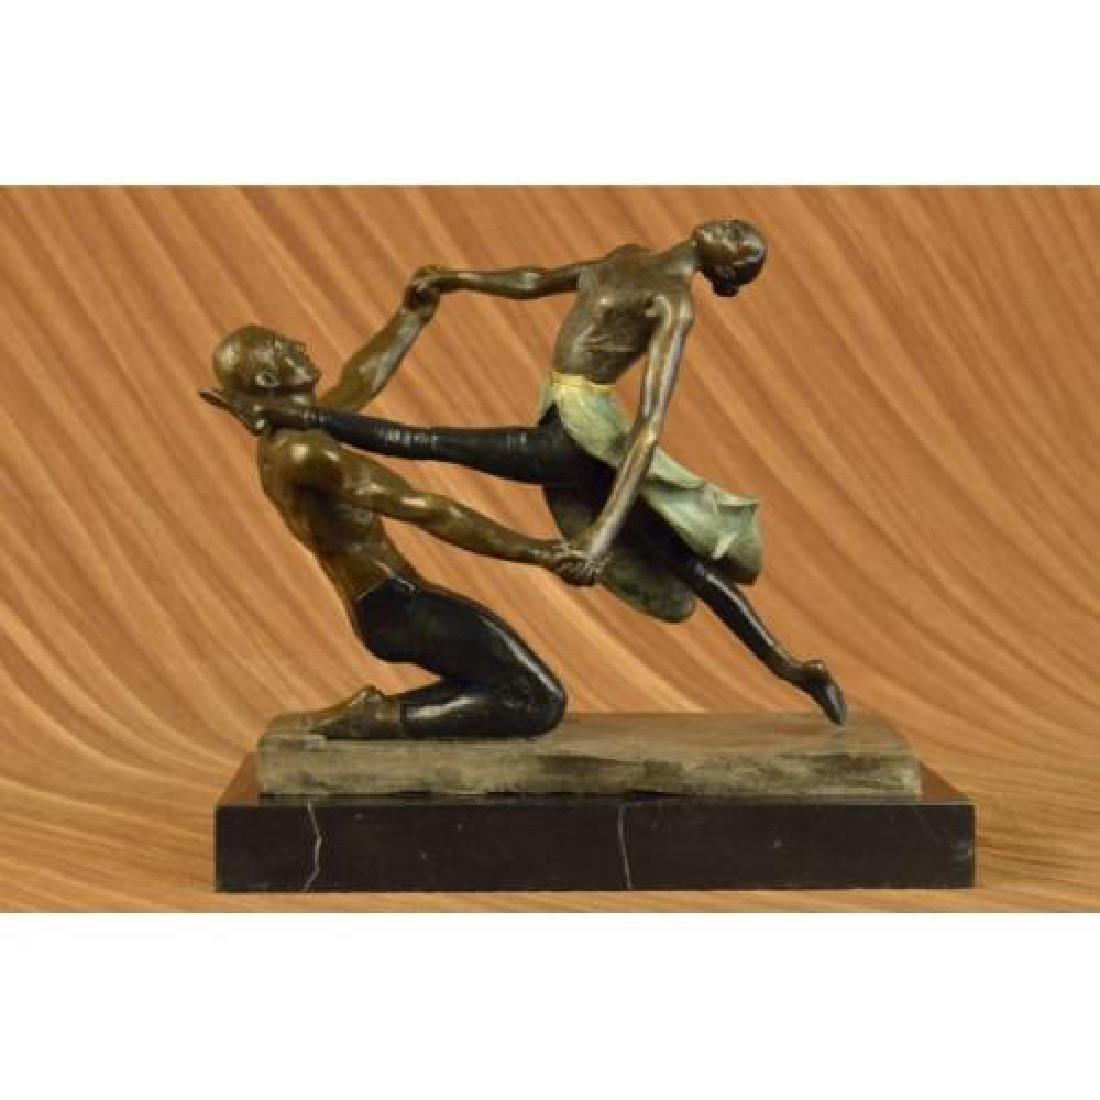 Ballerina Dance Bronze Statue on Marble Base Sculpture